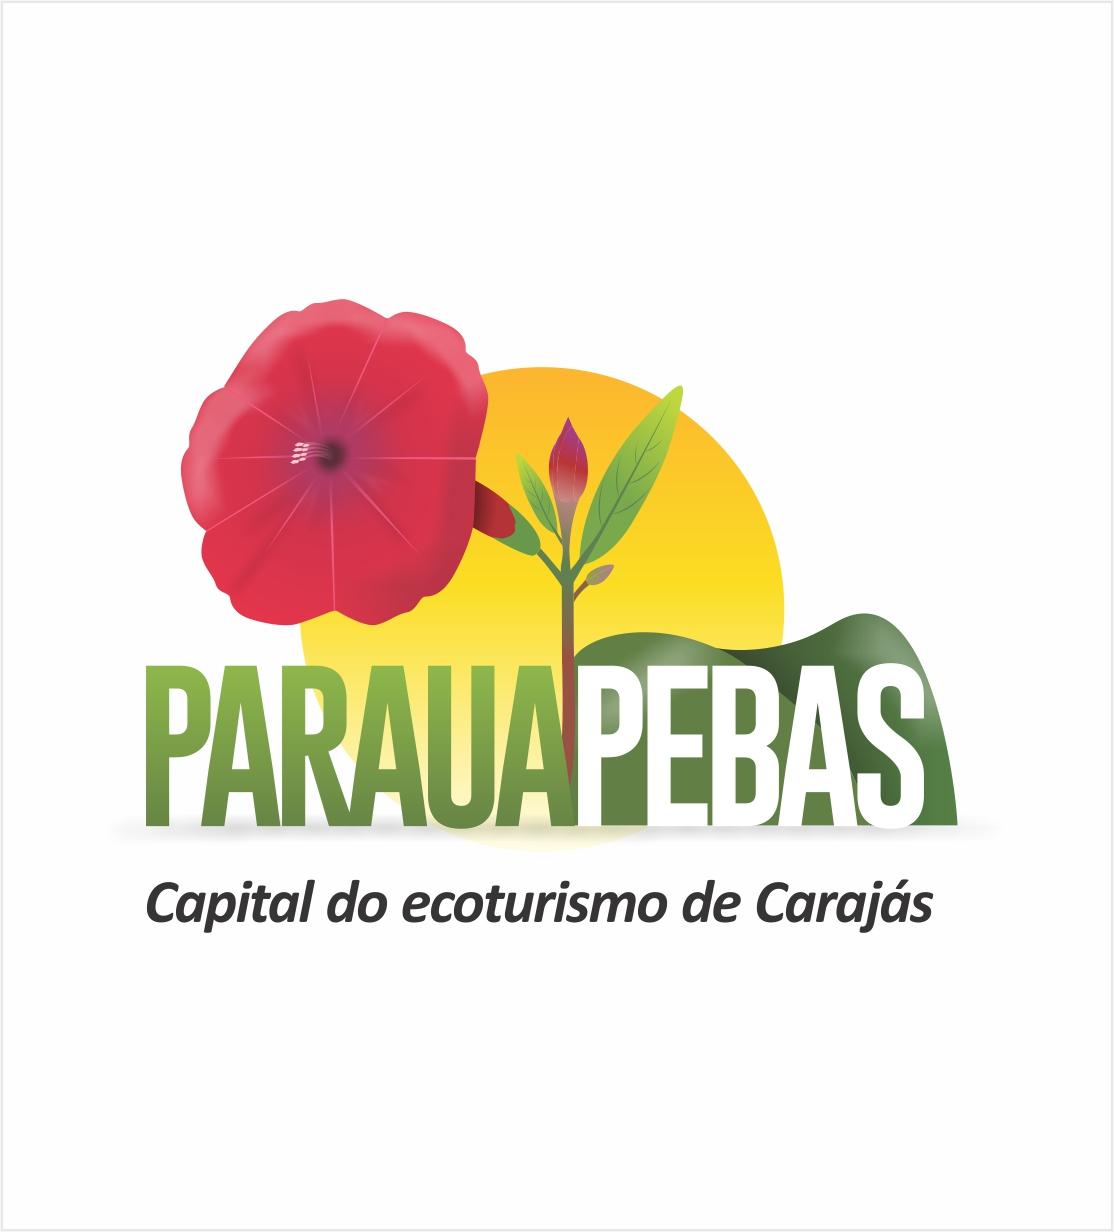 LOGO TURISMO PARAUAPEBAS - PARÁ (1).png